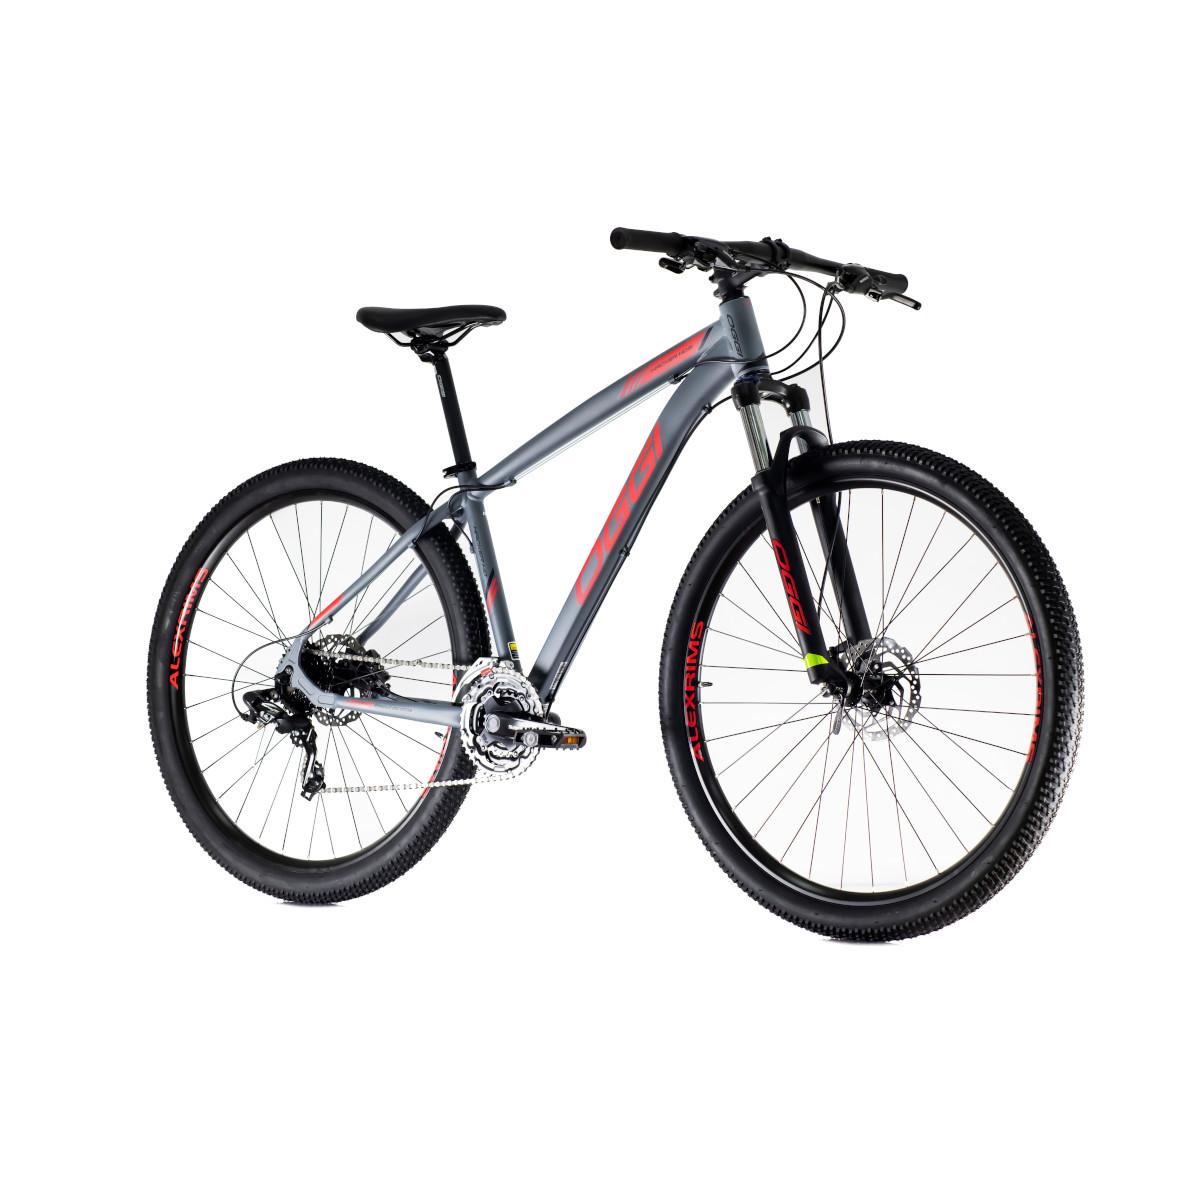 Bicicleta Oggi Hacker HDS aro 29 24v Hidraulico Cinza/Verm